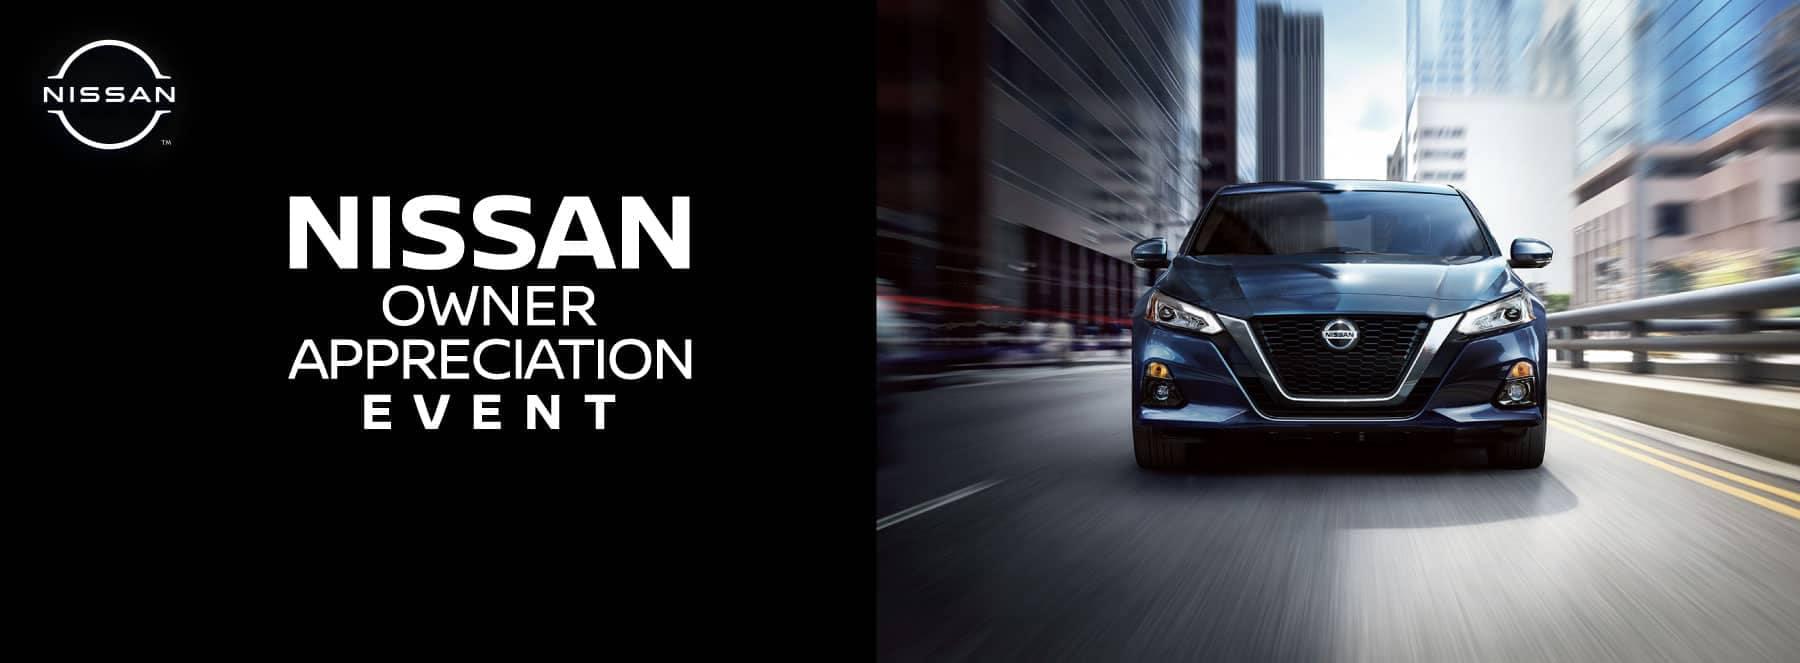 Nissan Owner Appreciation